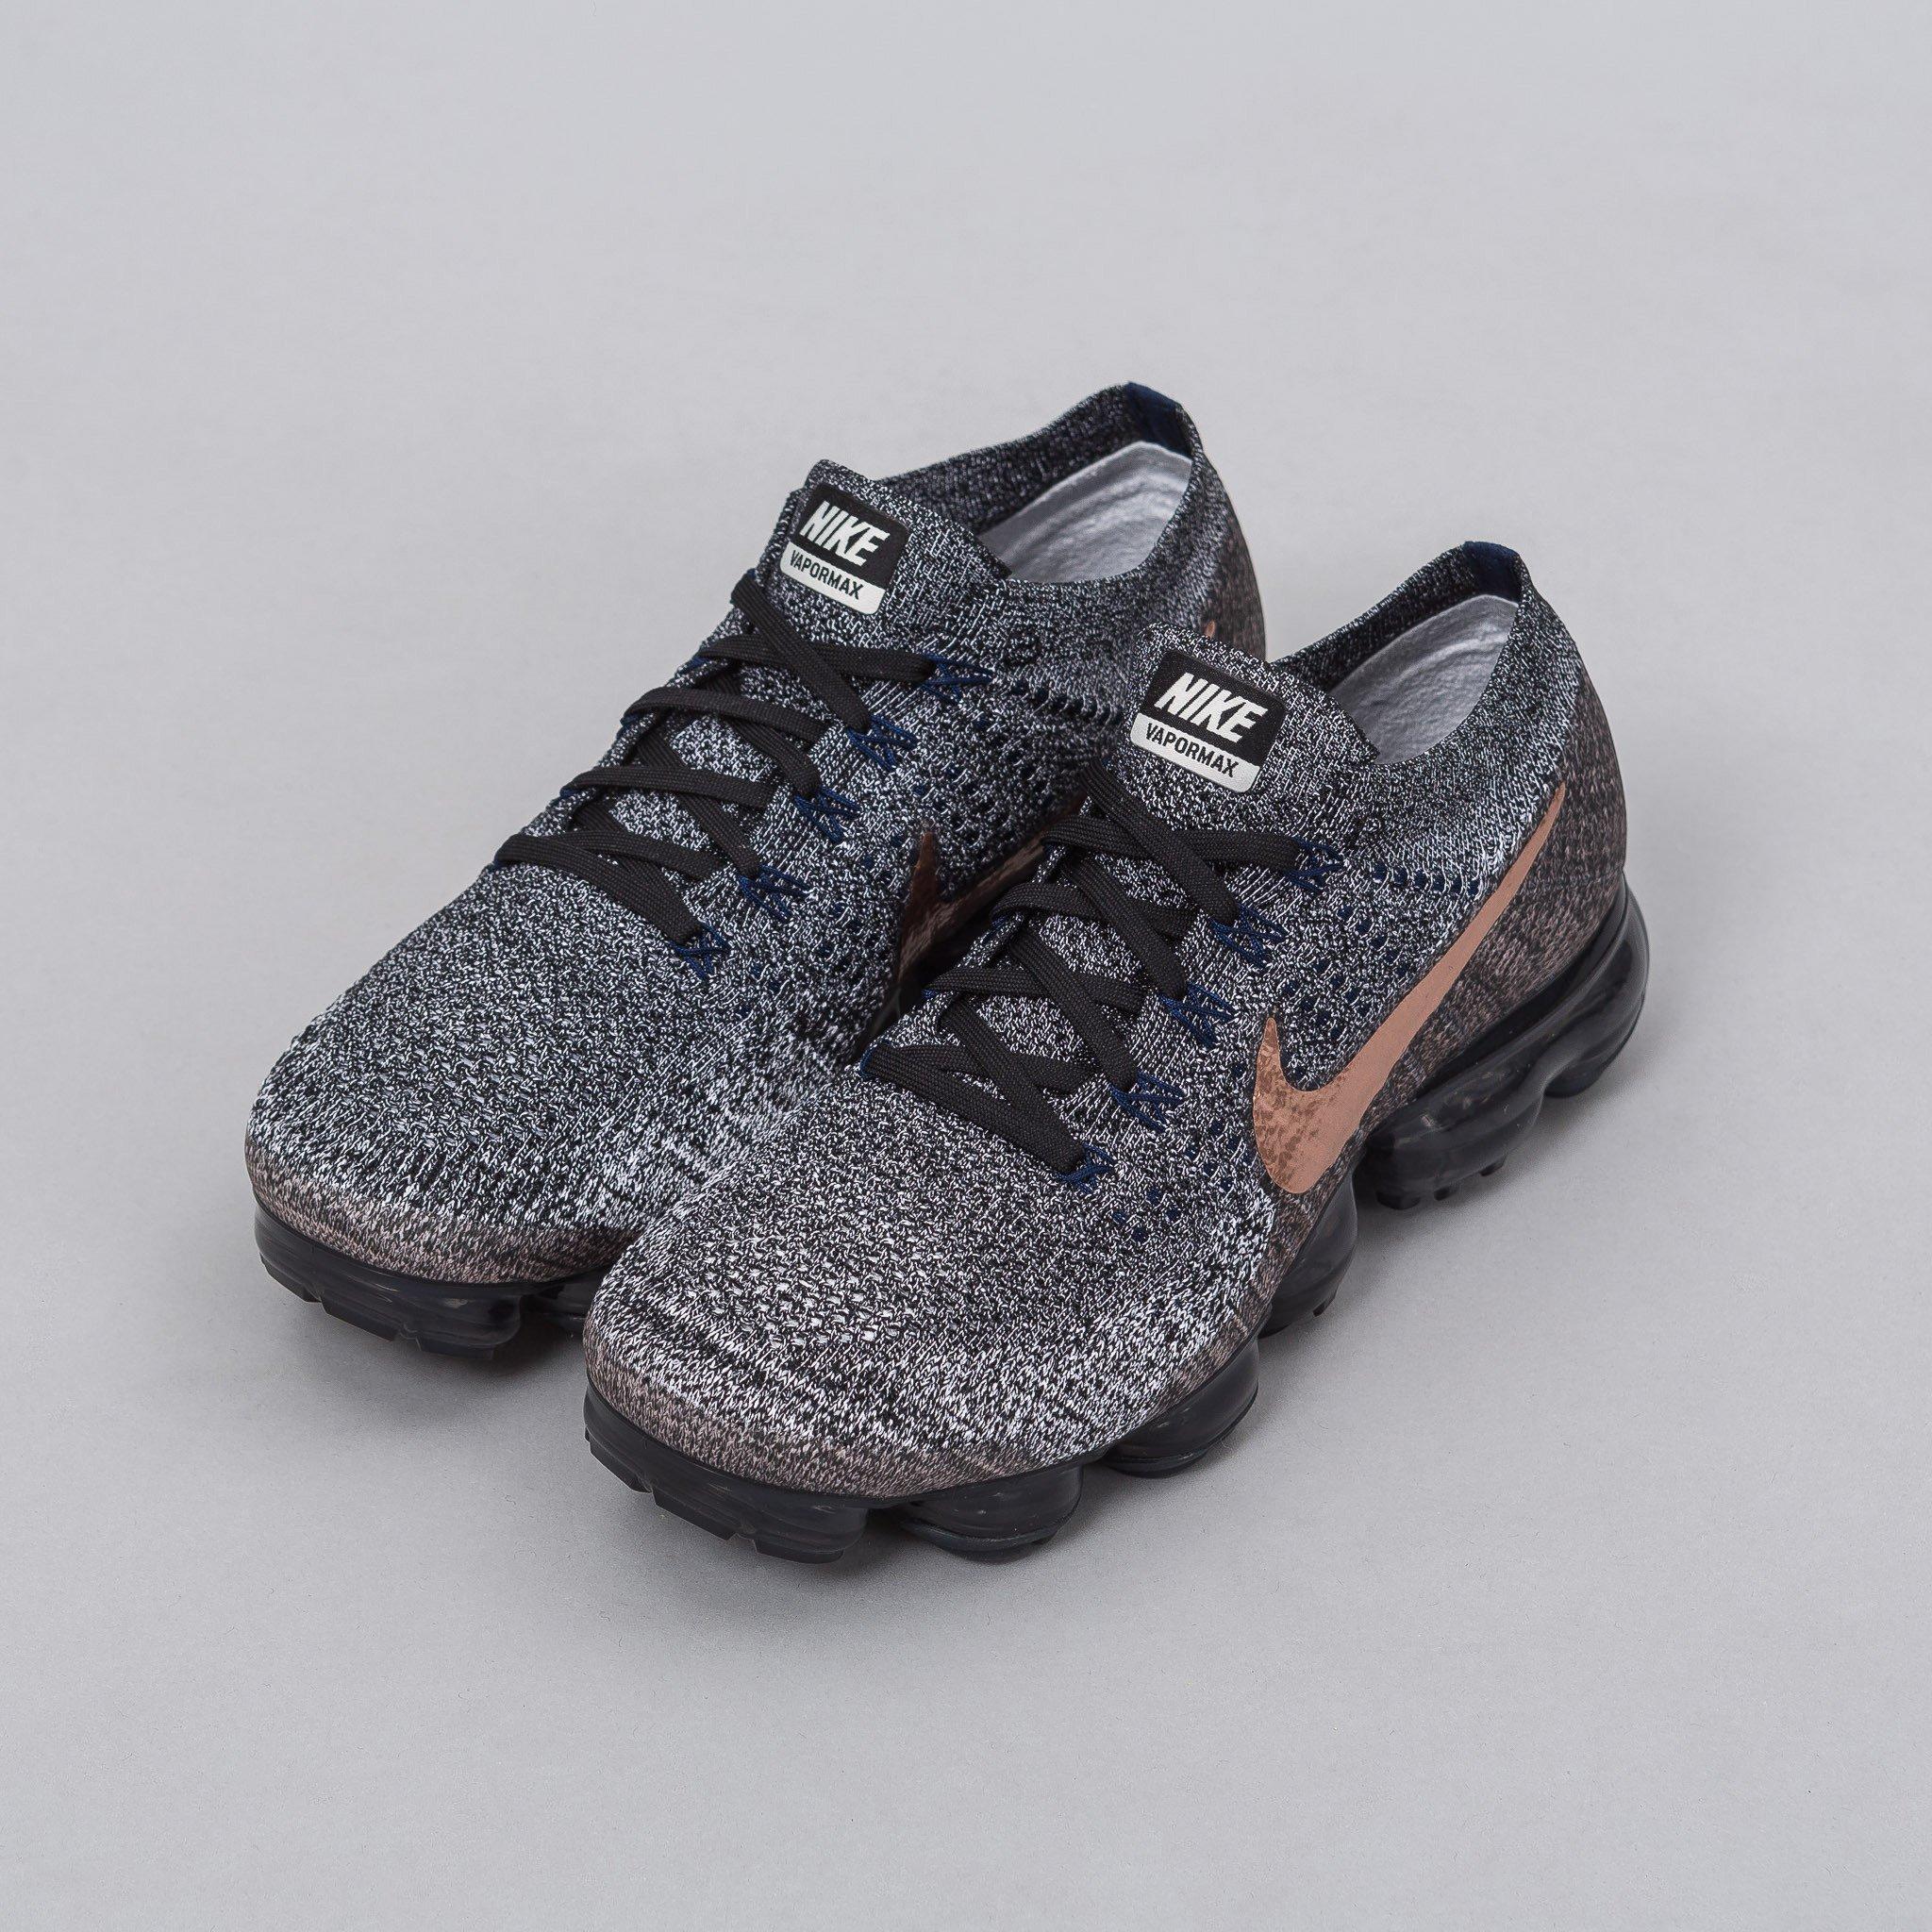 ee4484d17d3 Lyst - Nike Air Vapormax Flyknit In Black metallic Bronze in ...